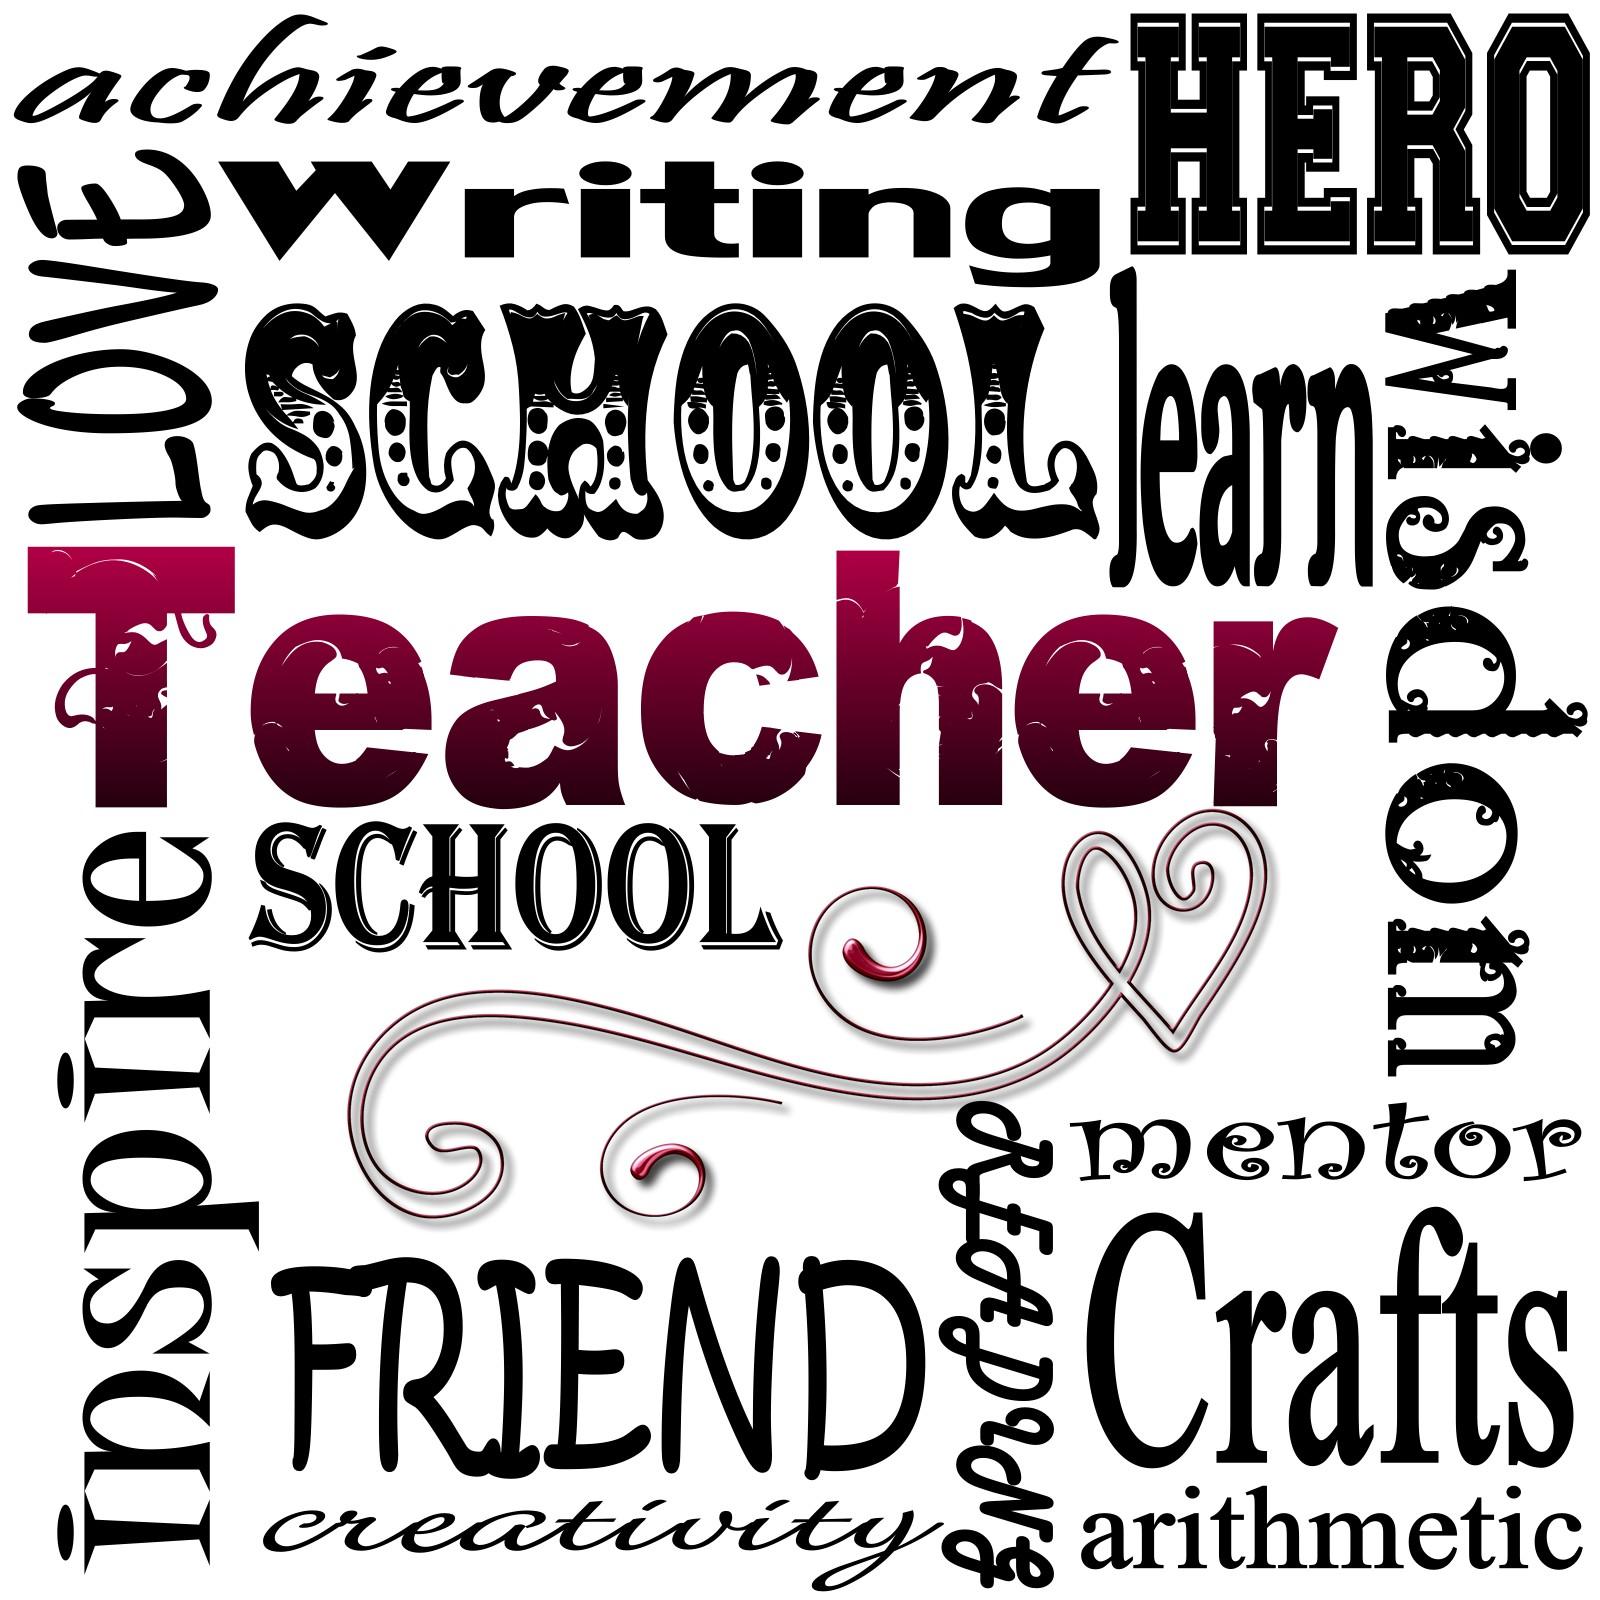 Appreciation Quotes: Cute Teacher Appreciation Quotes. QuotesGram